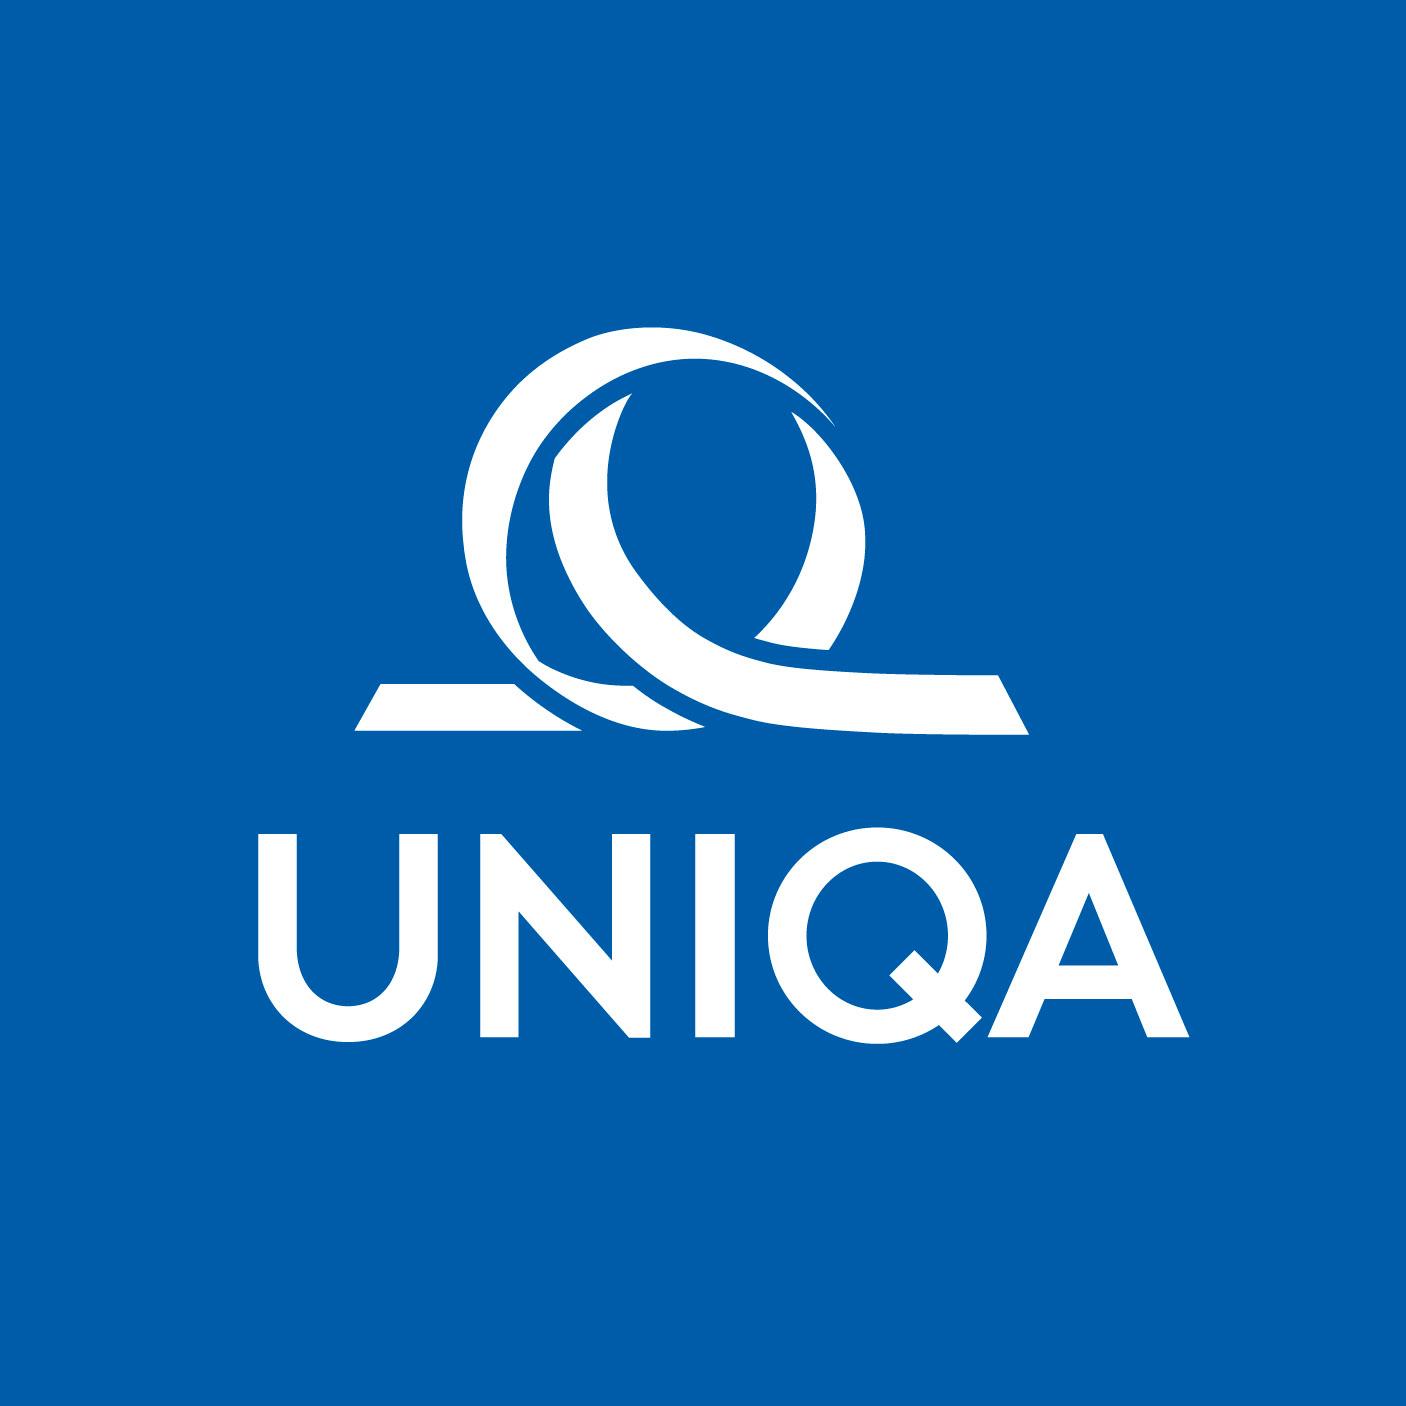 UNIQA ServiceCenter & Kfz Zulassungsstelle Wörgl